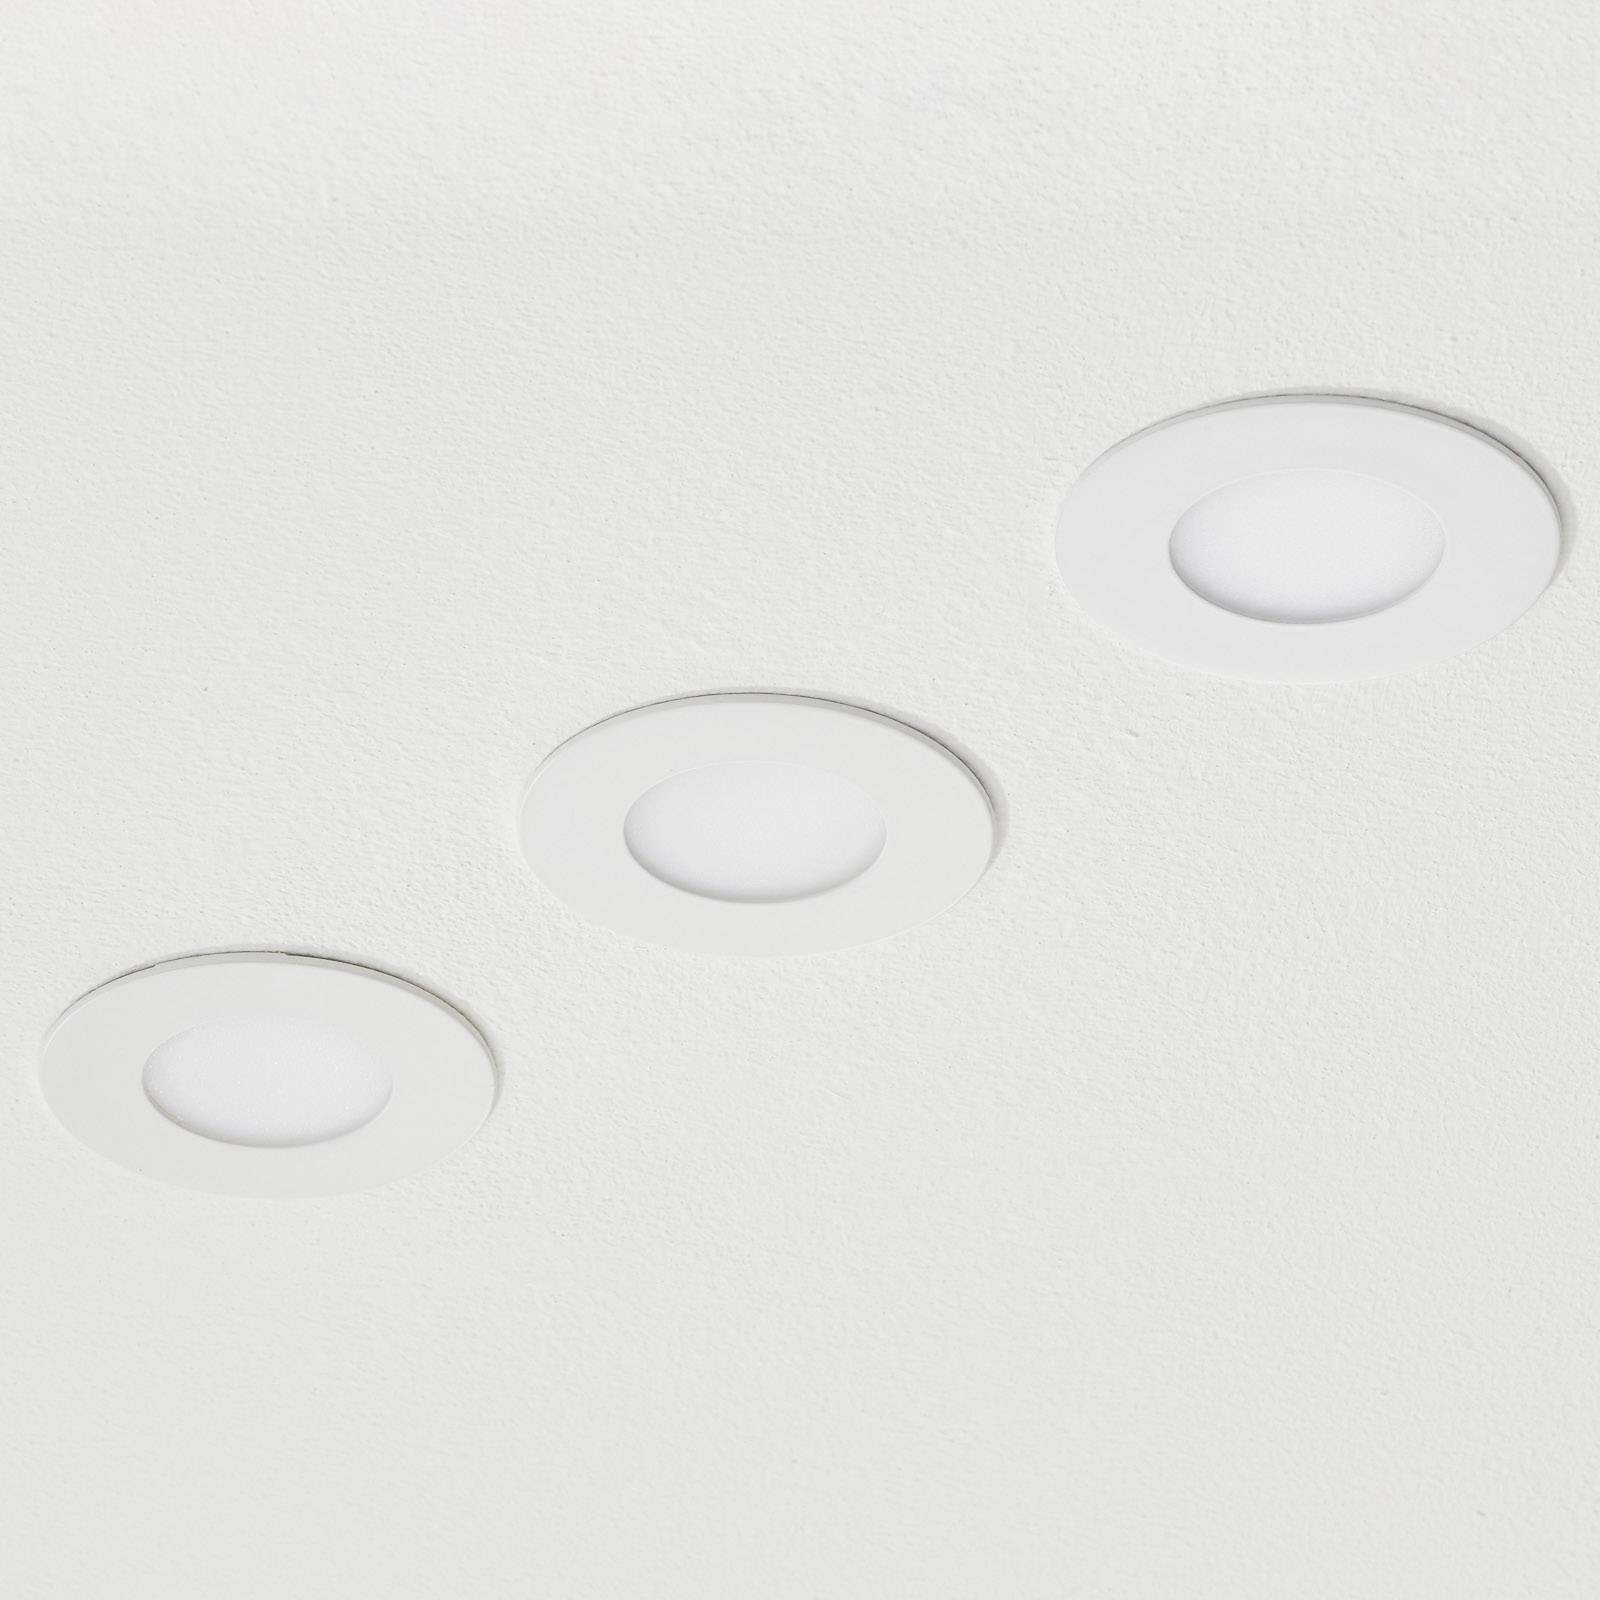 EGLO connect Fueva-C inbouwspot 3 x 3W, RGBW wit